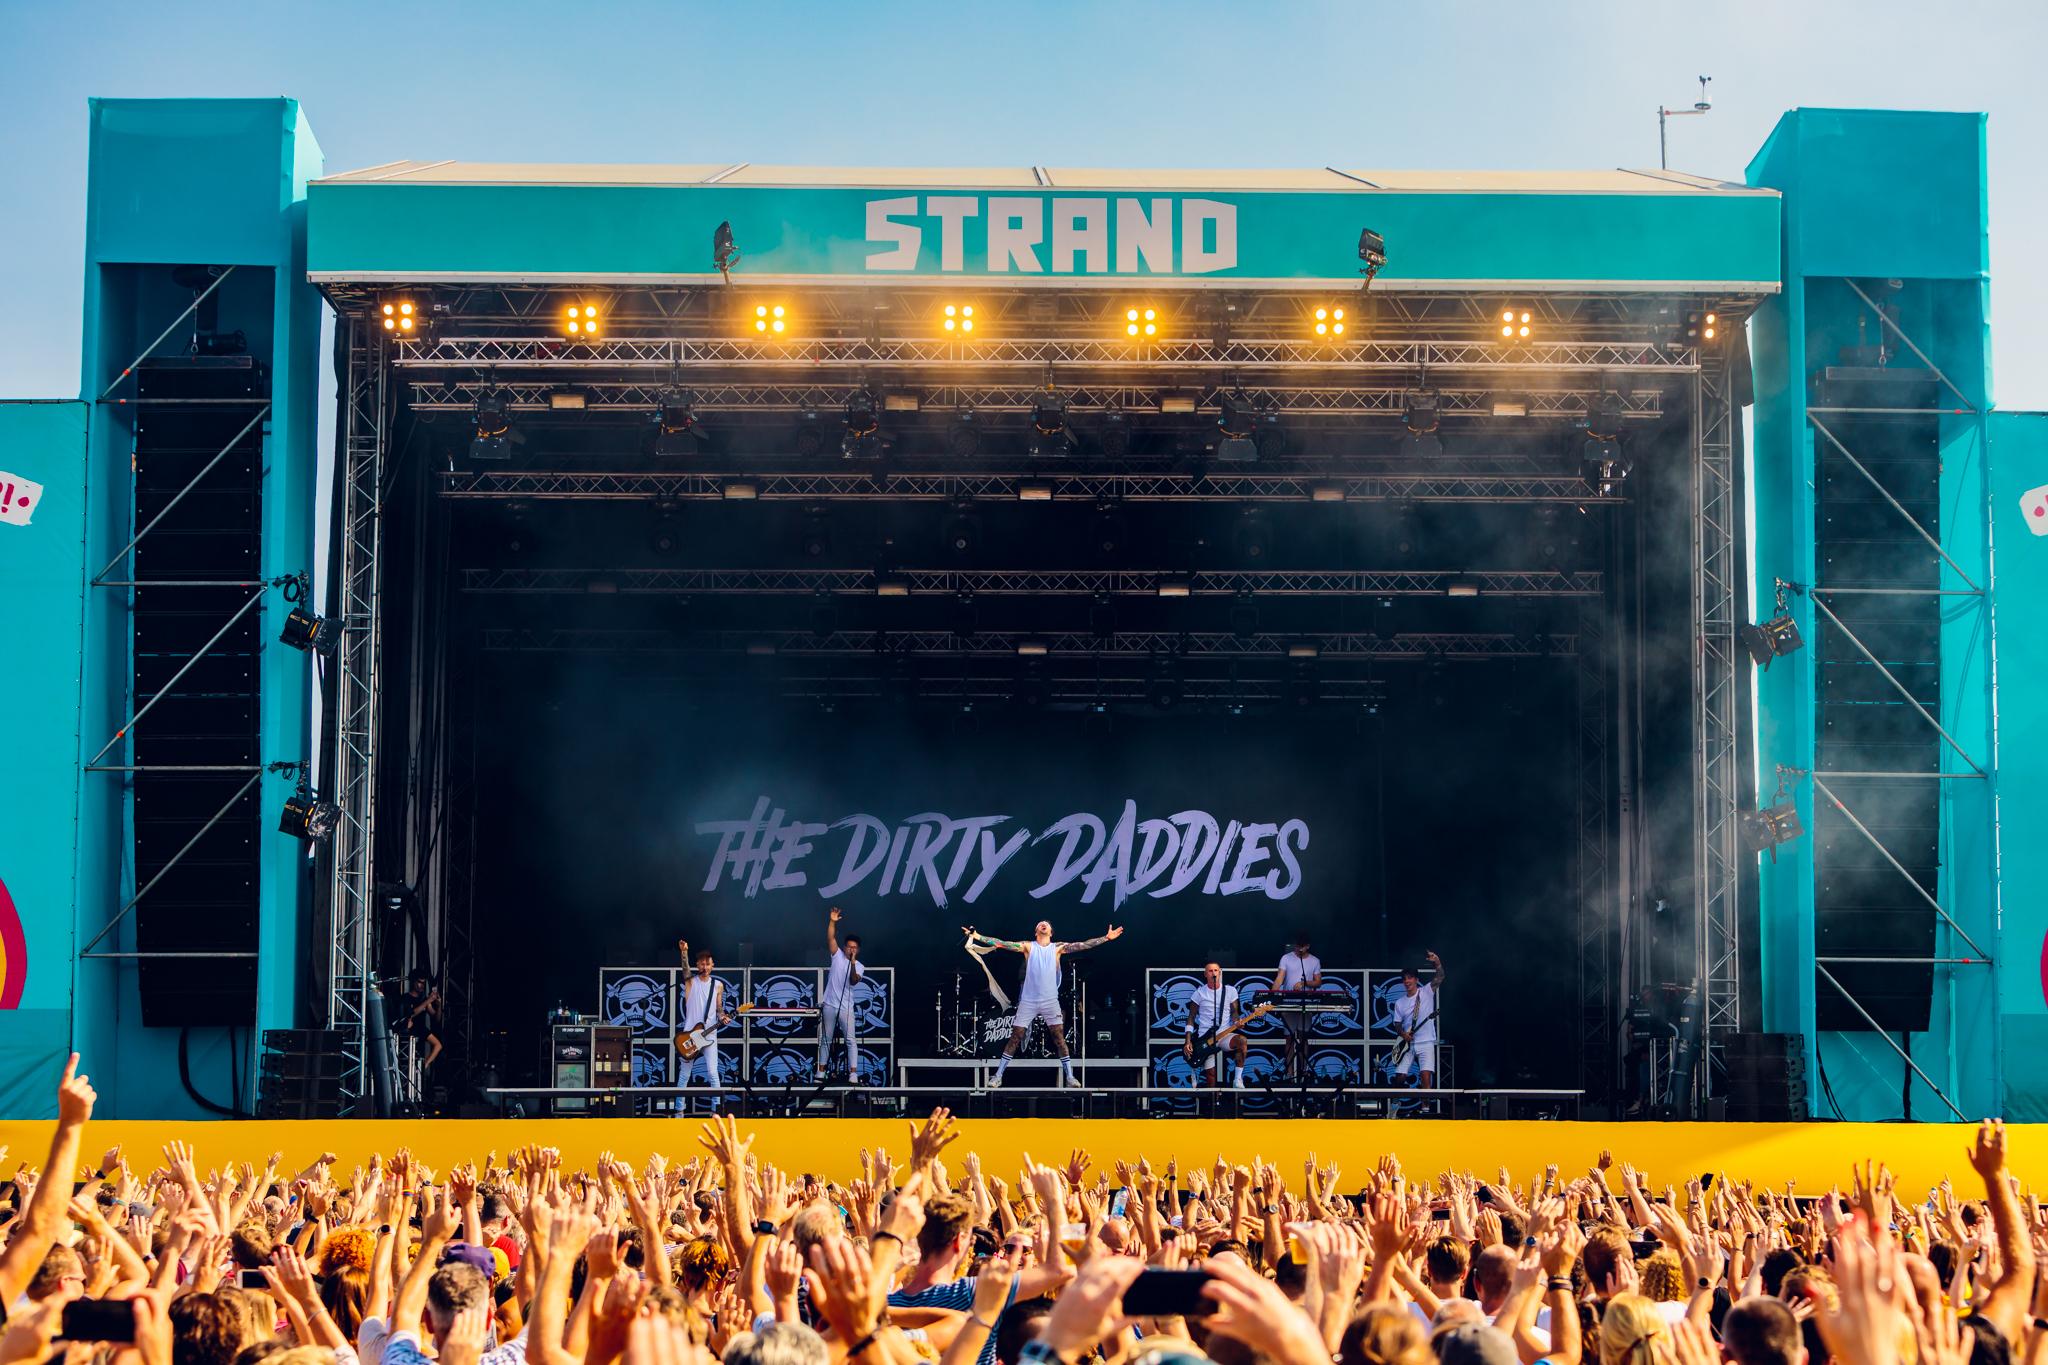 Dirty Daddies op festival Strand